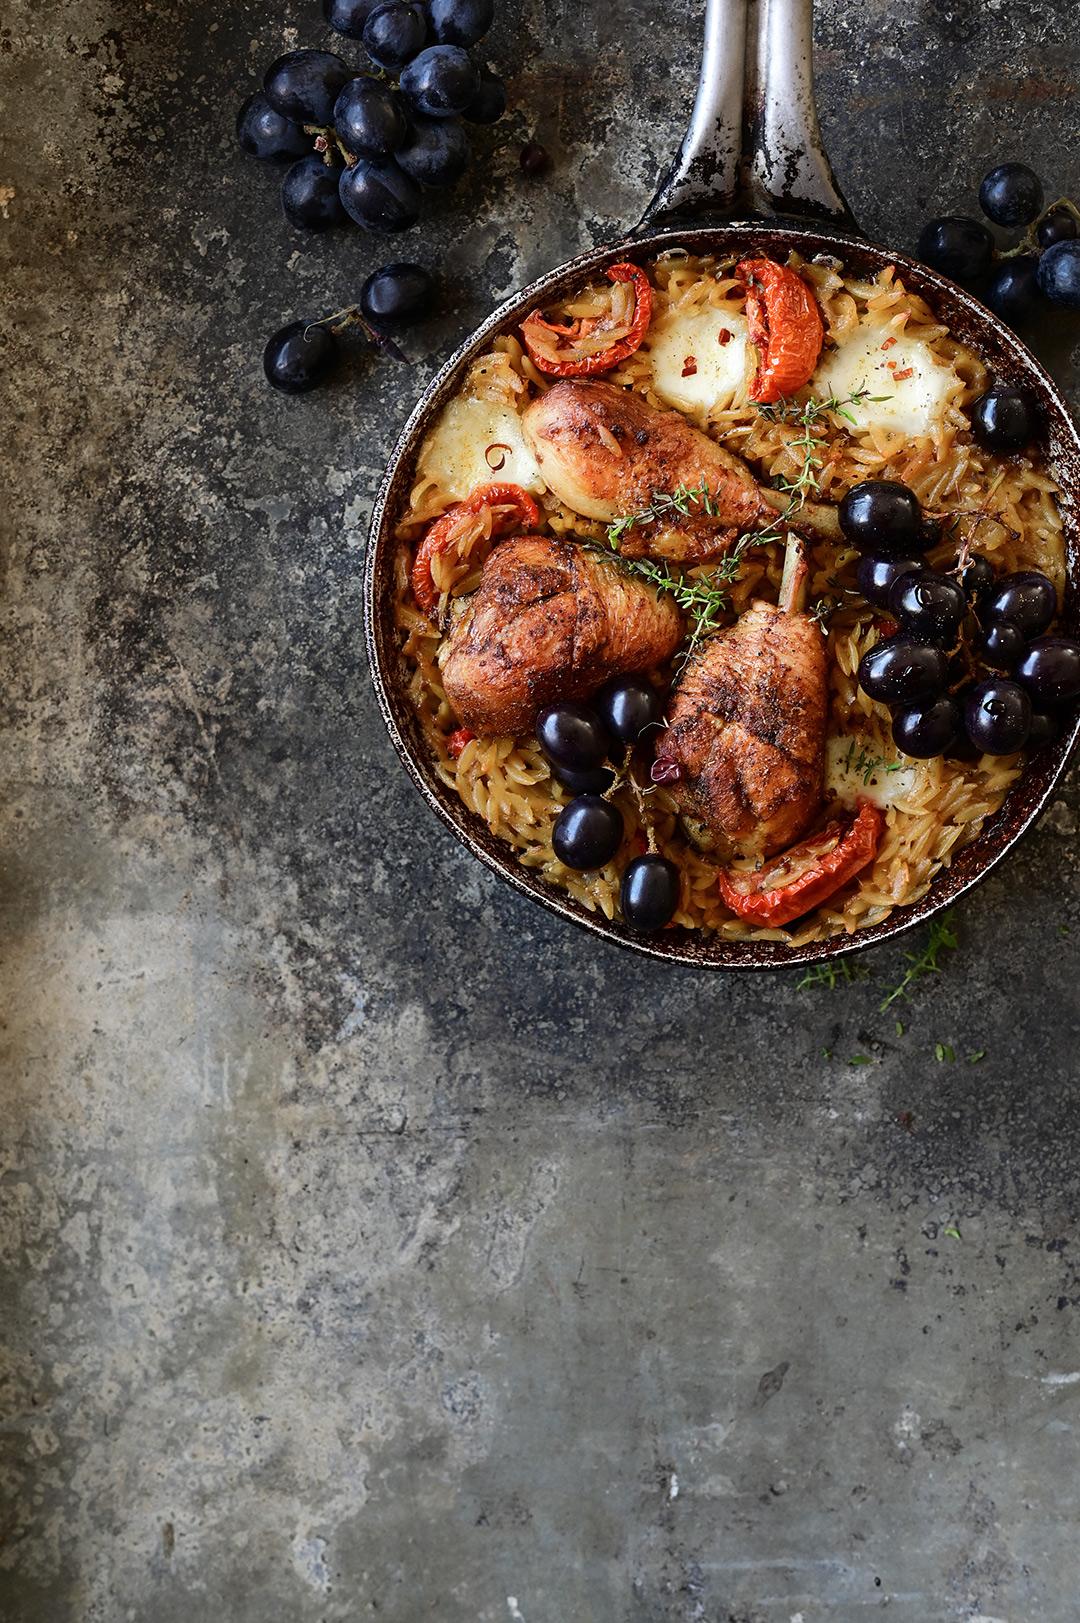 serving dumplings | Orzo met geroosterde kip en druiven